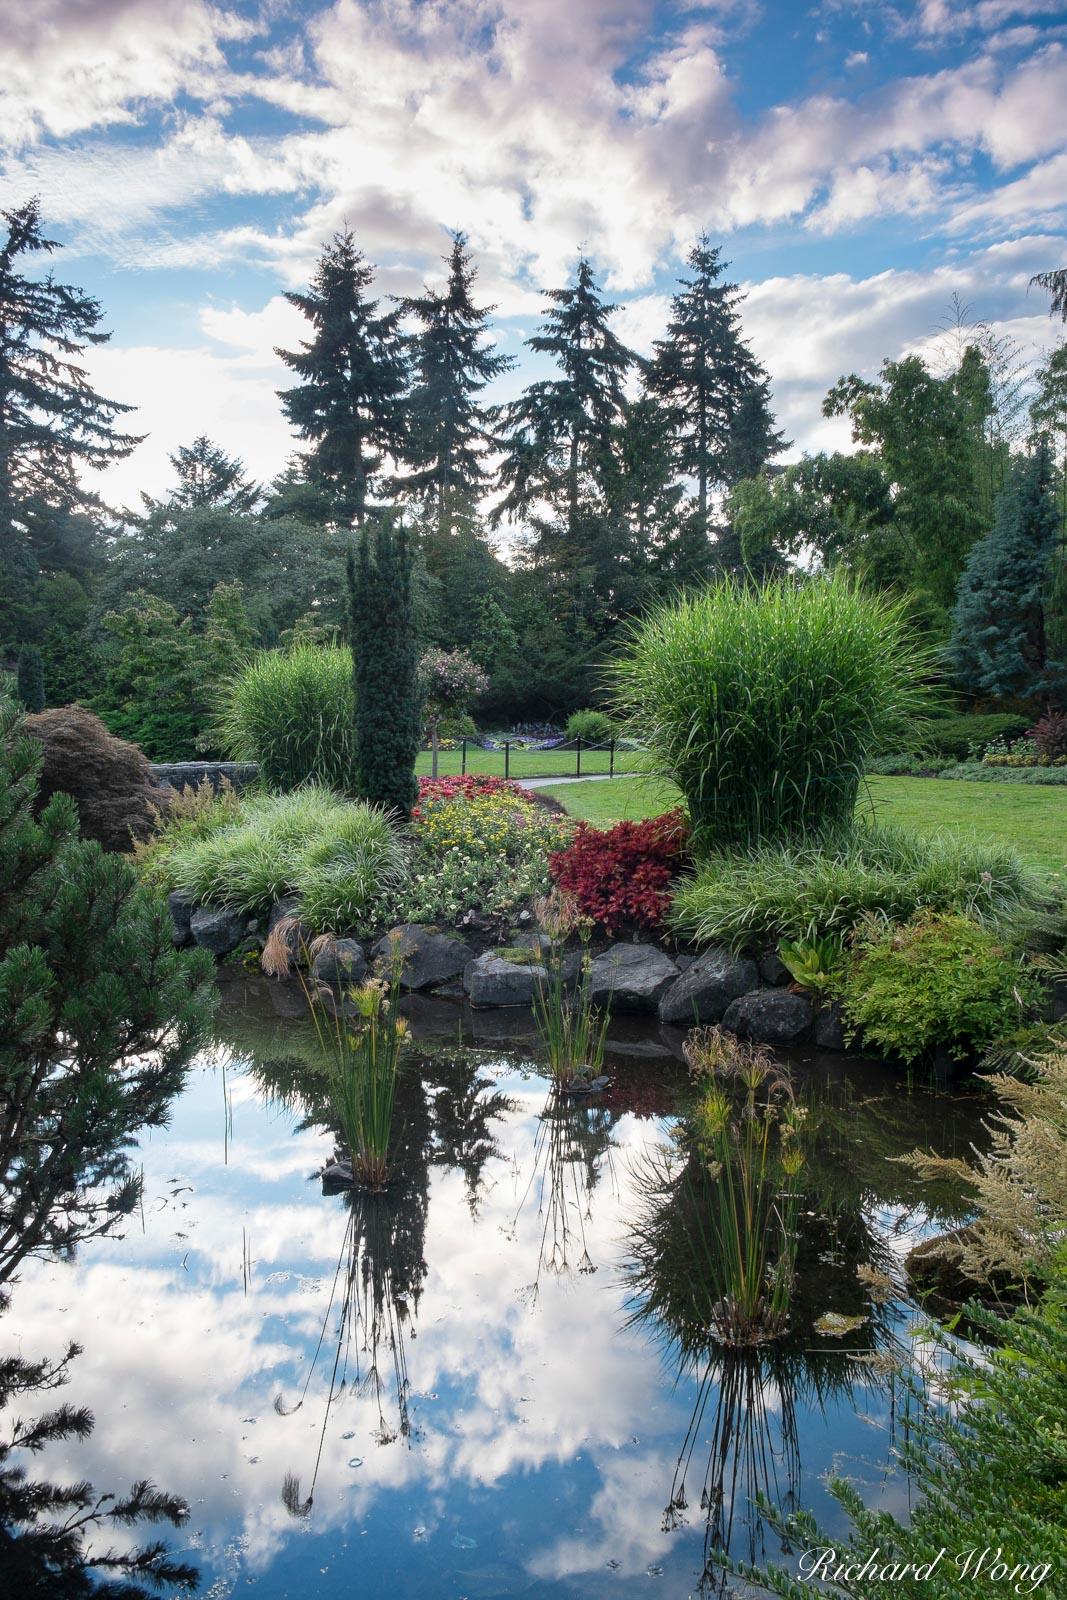 Pond Reflections in Quarry Garden at Queen Elizabeth Park, Vancouver, B.C.